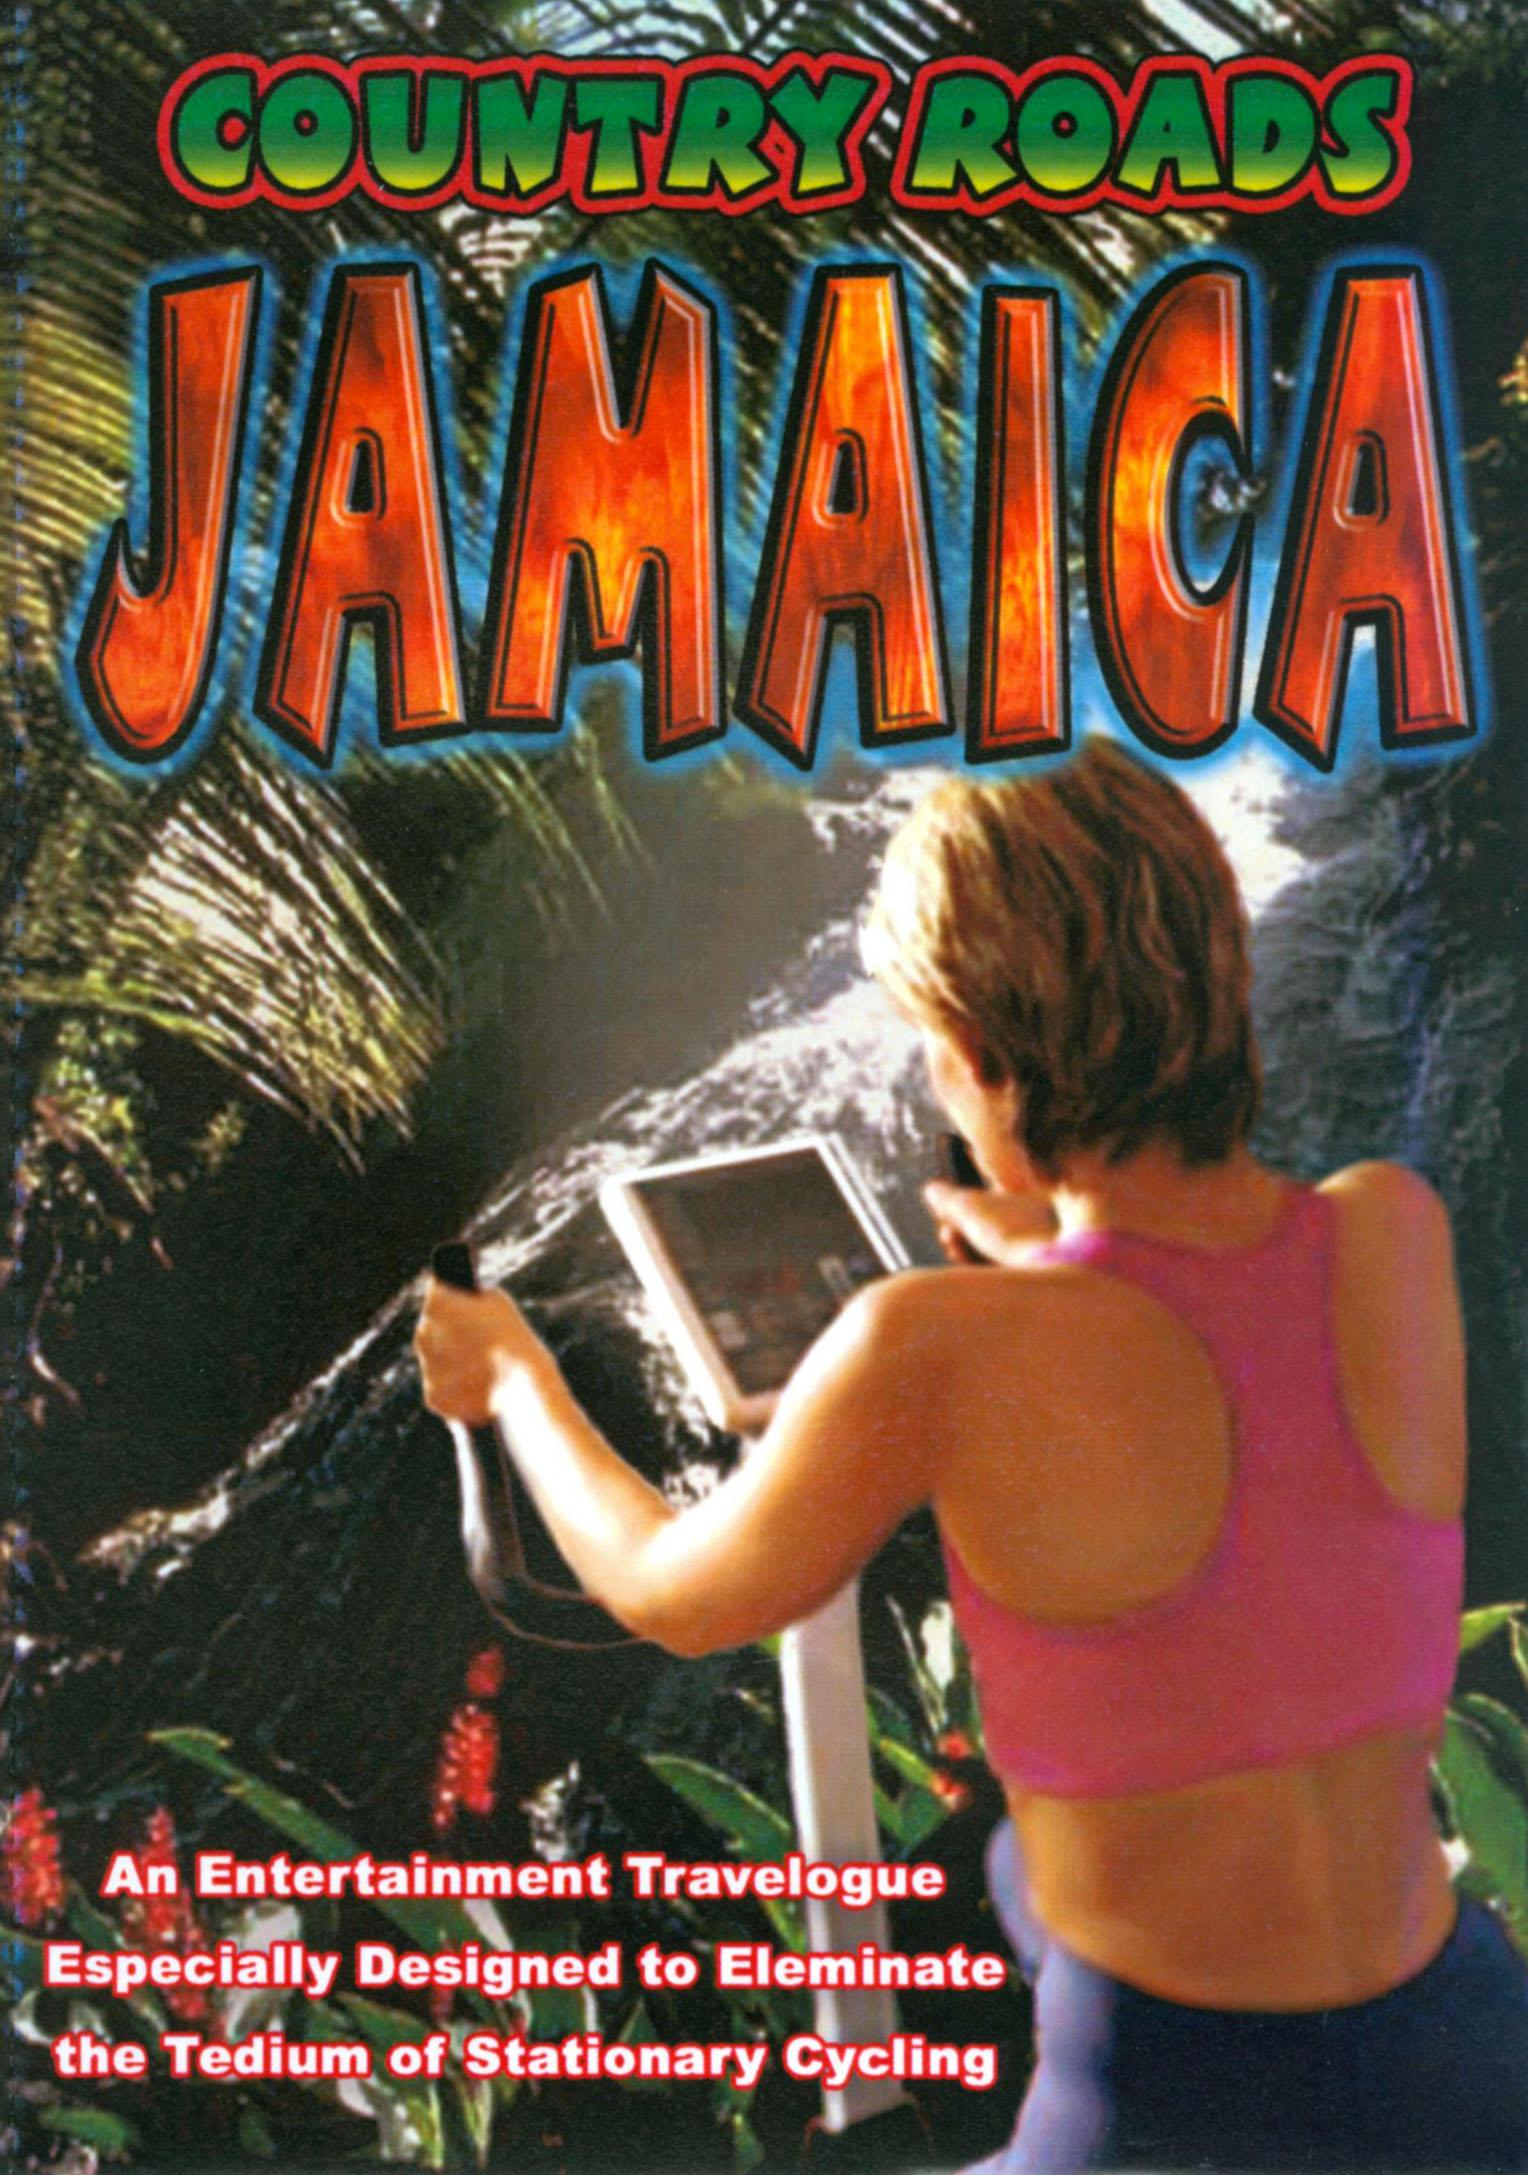 Country Roads: Jamaica